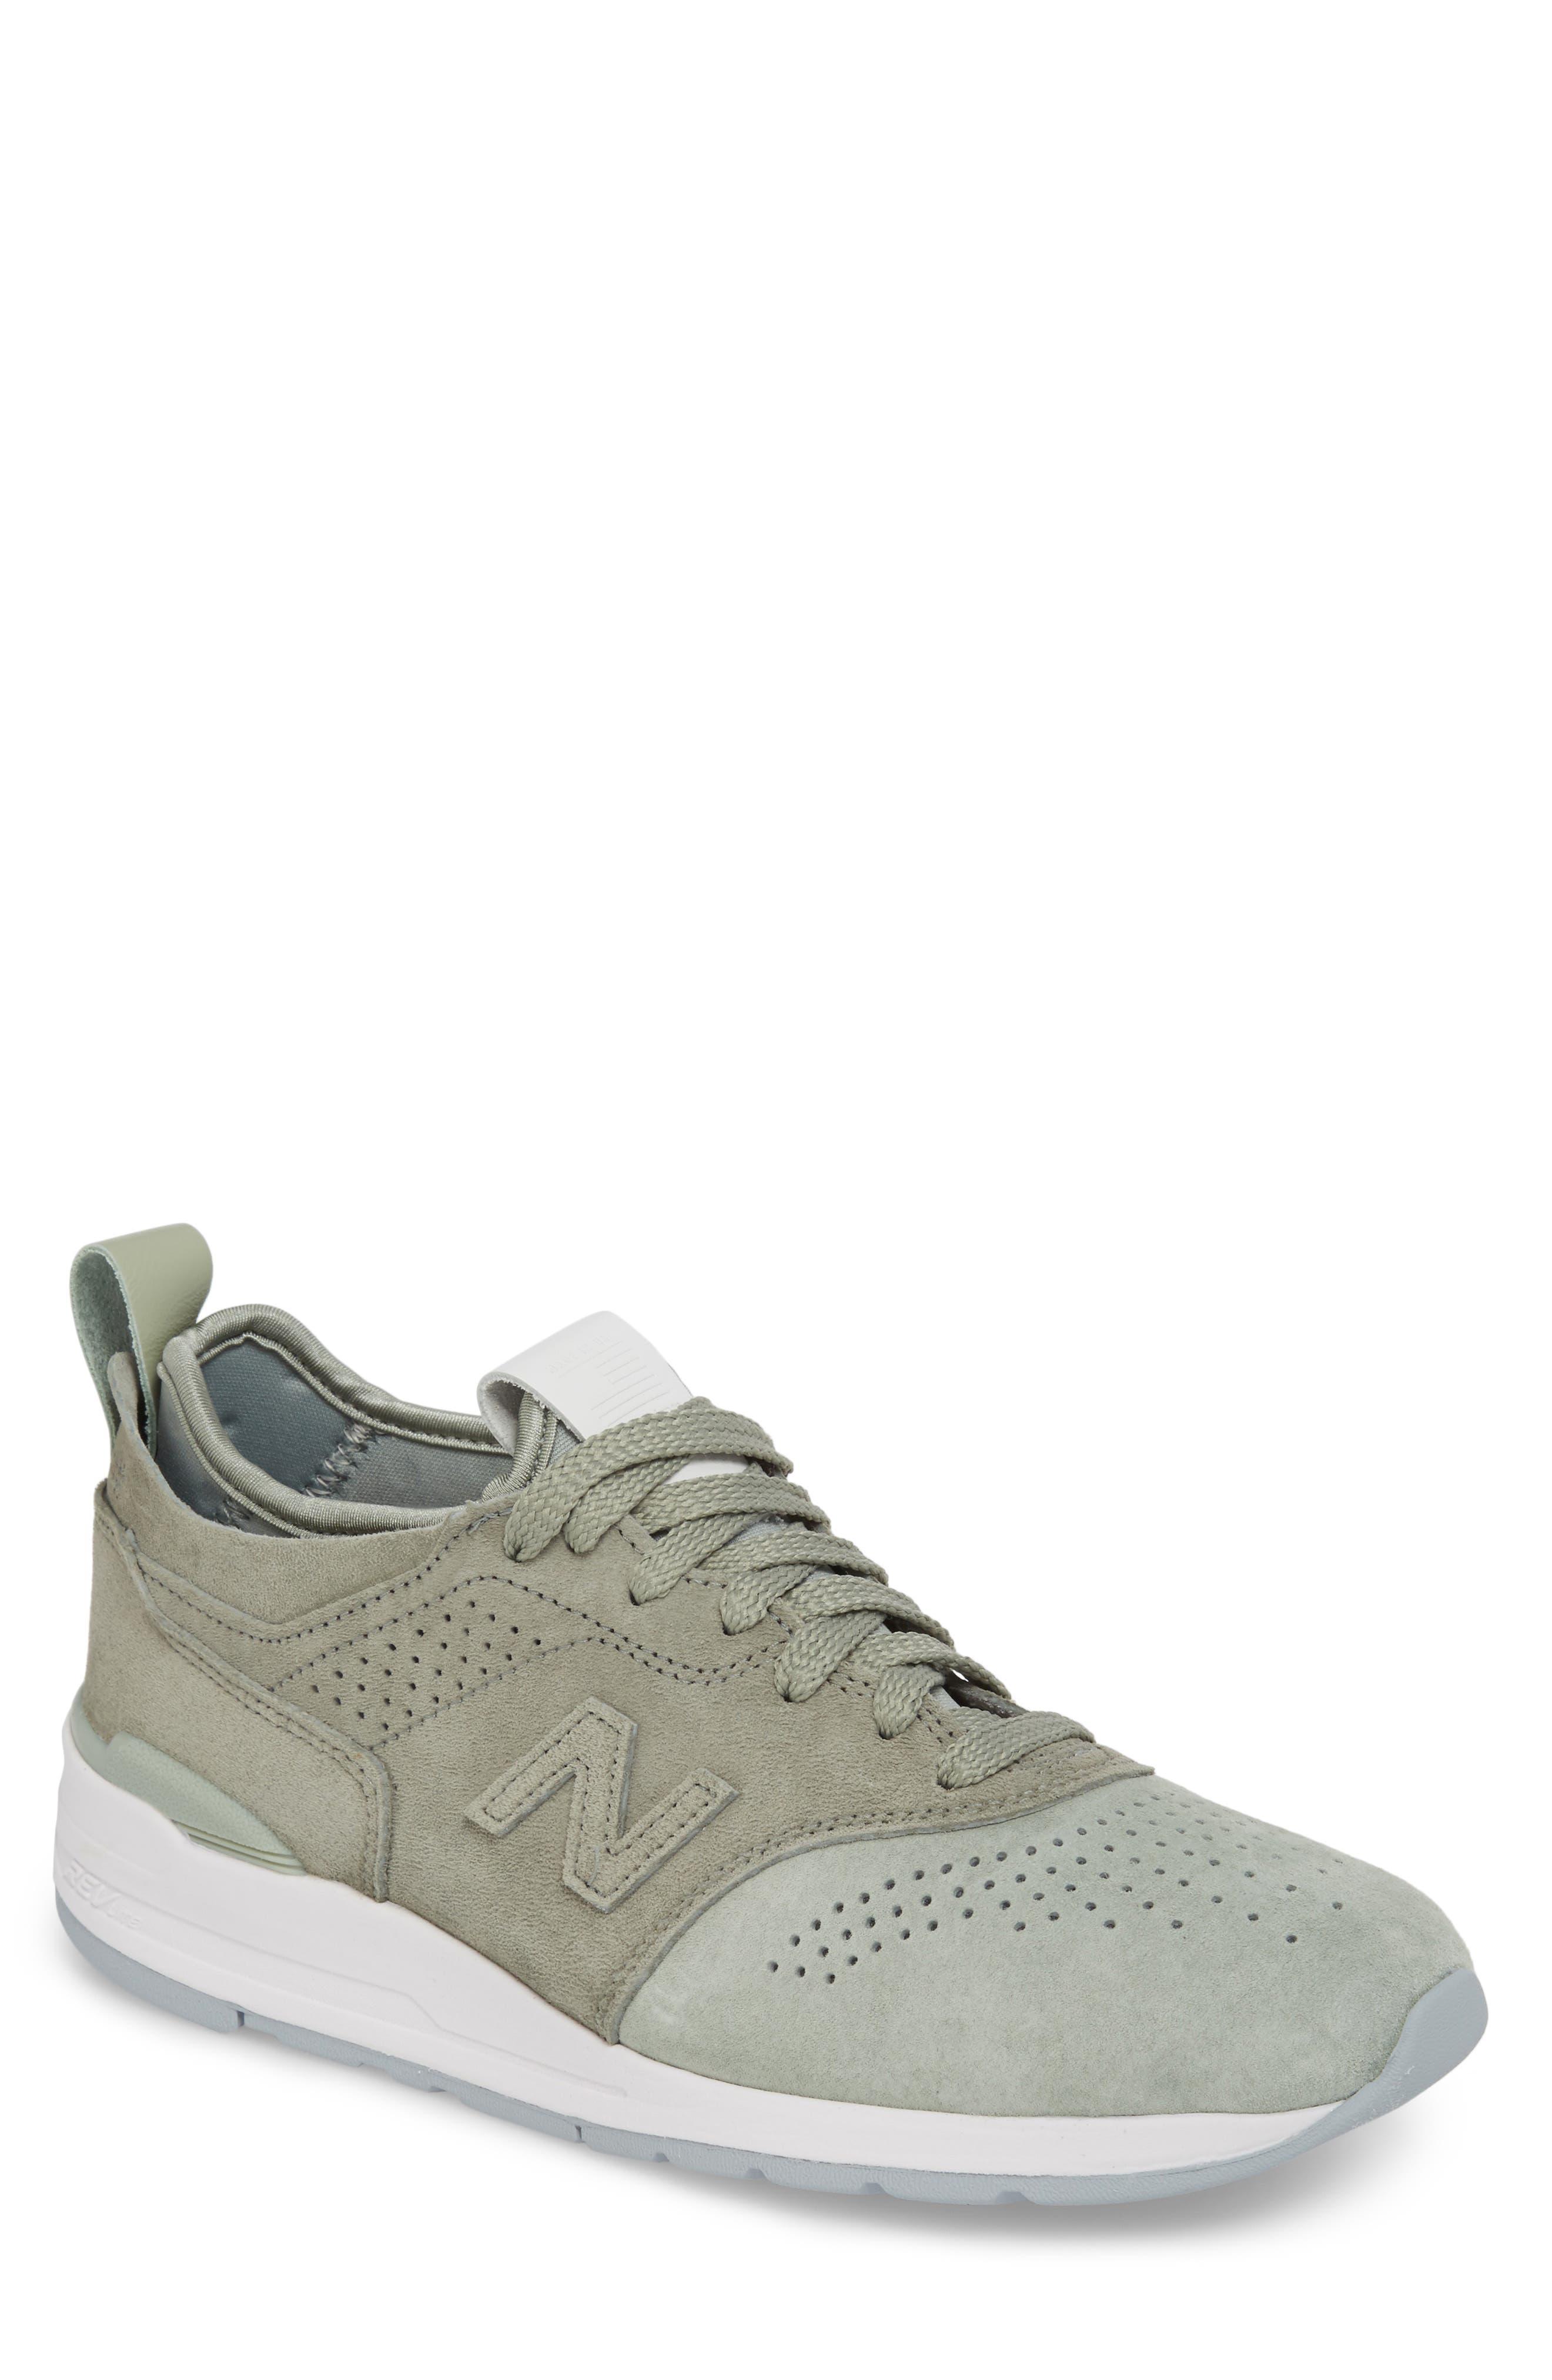 Alternate Image 1 Selected - New Balance 997R Perforated Sneaker (Men)